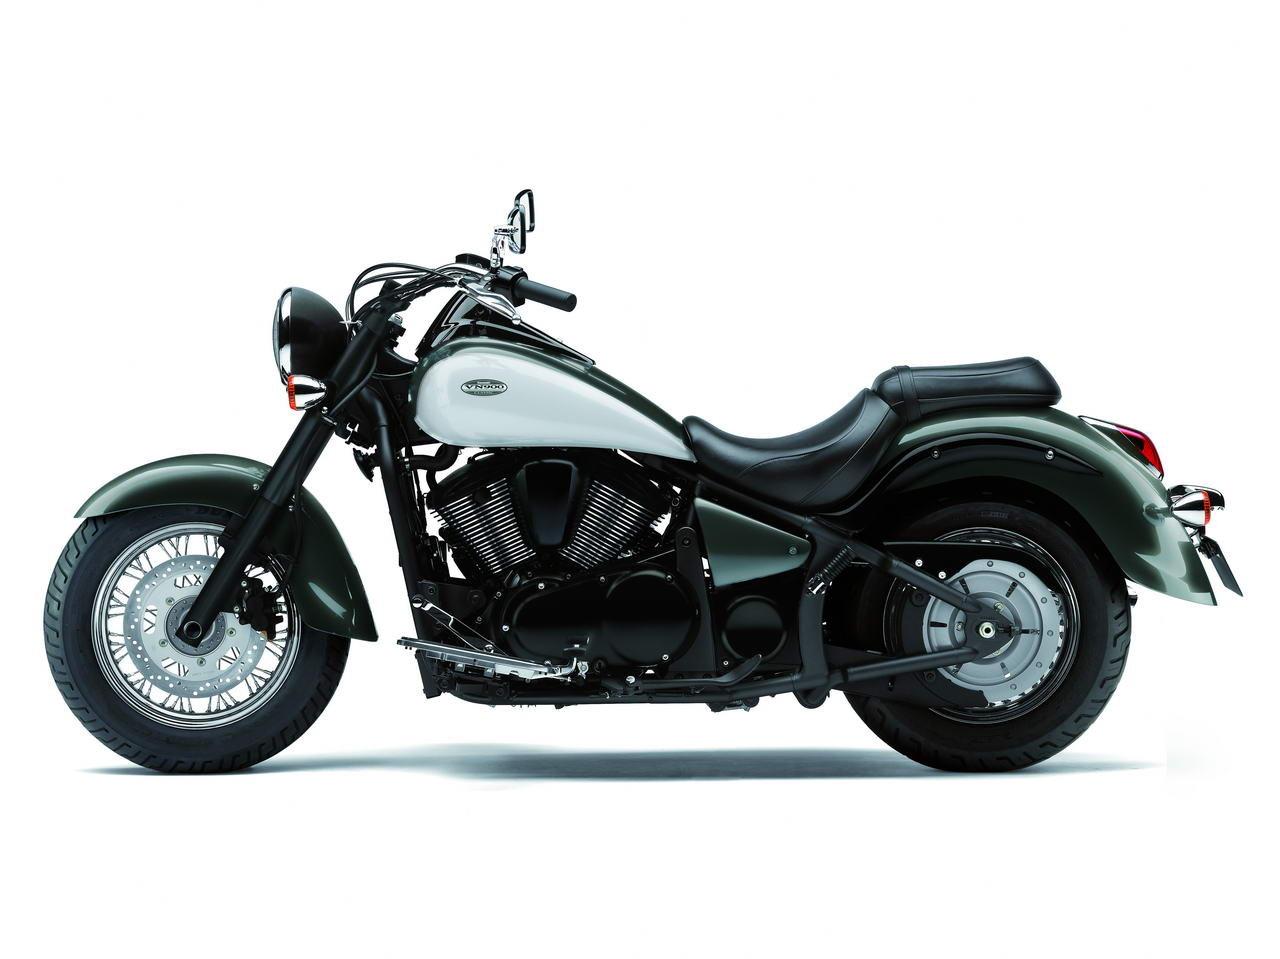 Listino Kawasaki Versys Base Granturismo on-off - image 15533_kawasaki-vn1700-voyager on http://moto.motori.net